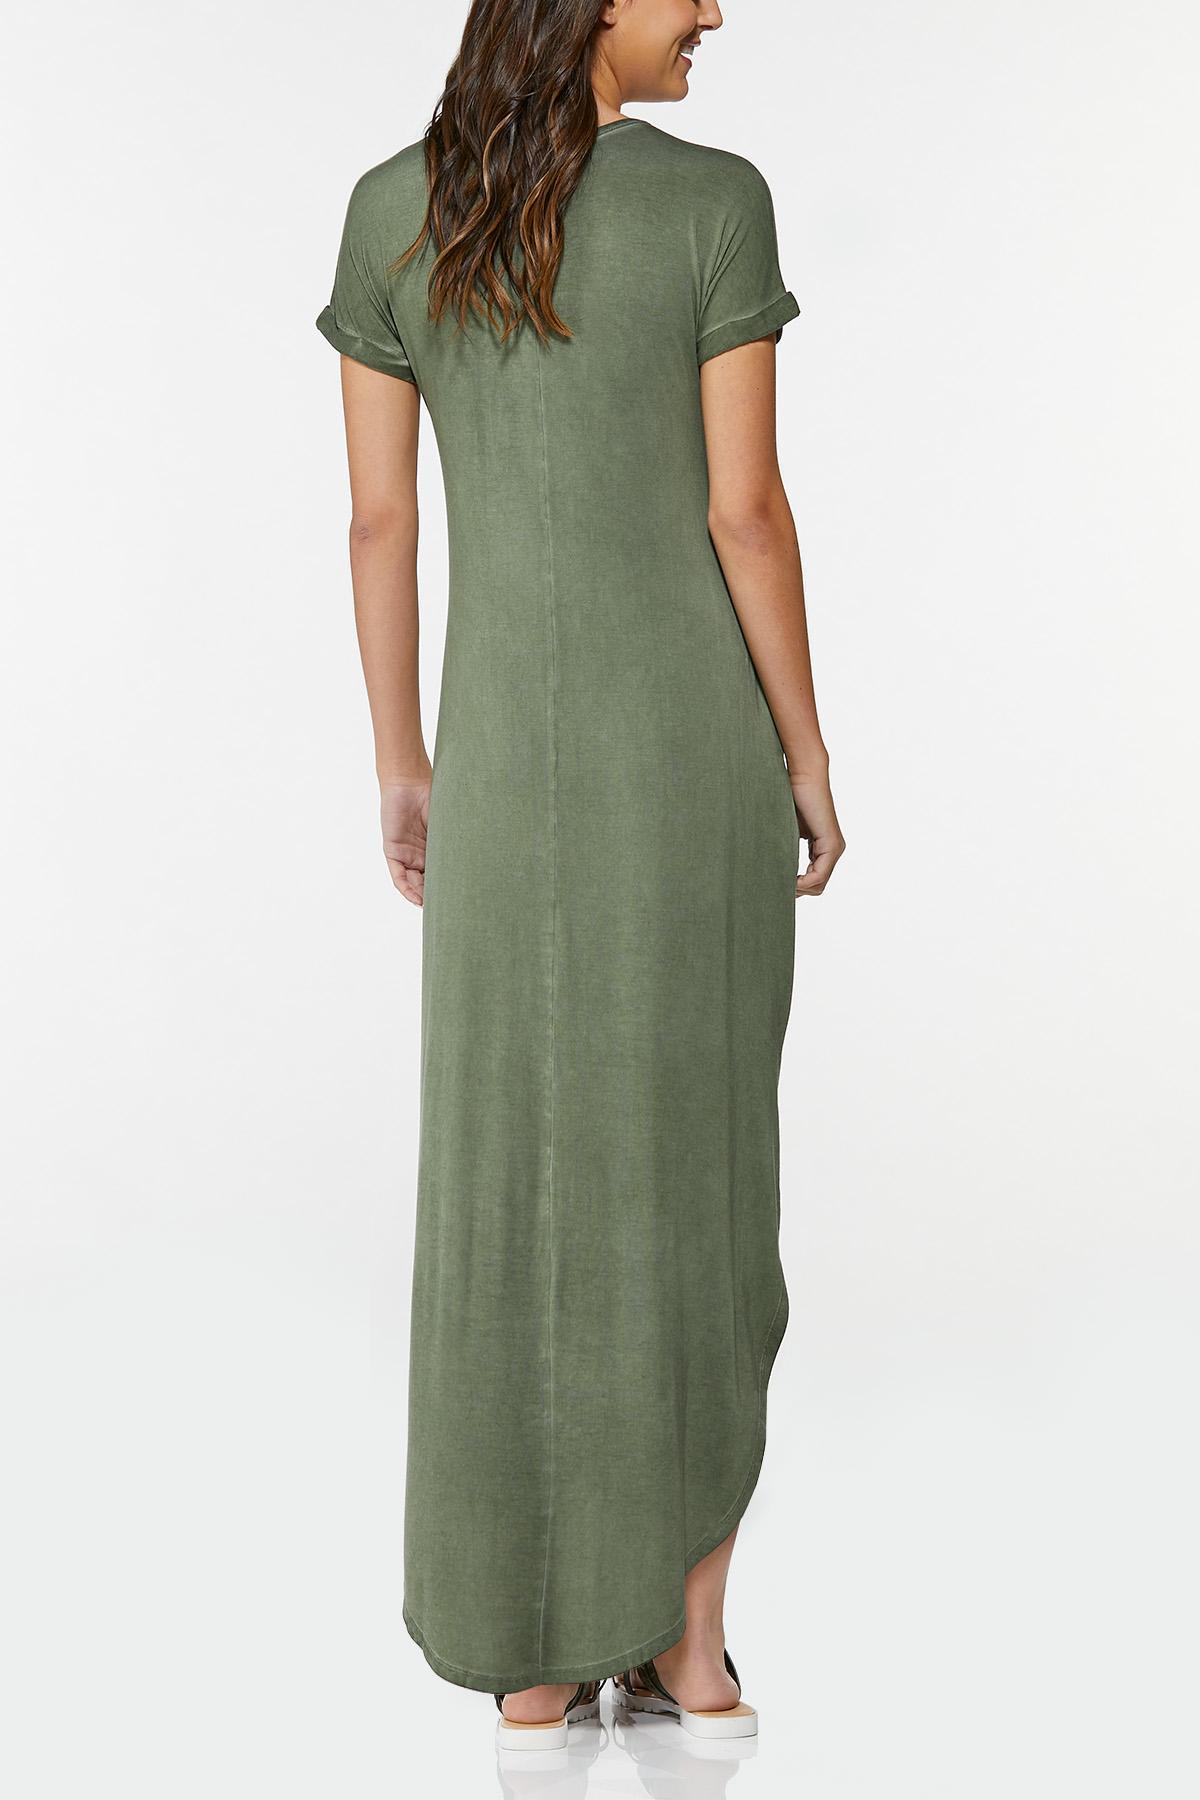 Rise Above Maxi Shirt Dress (Item #44695269)